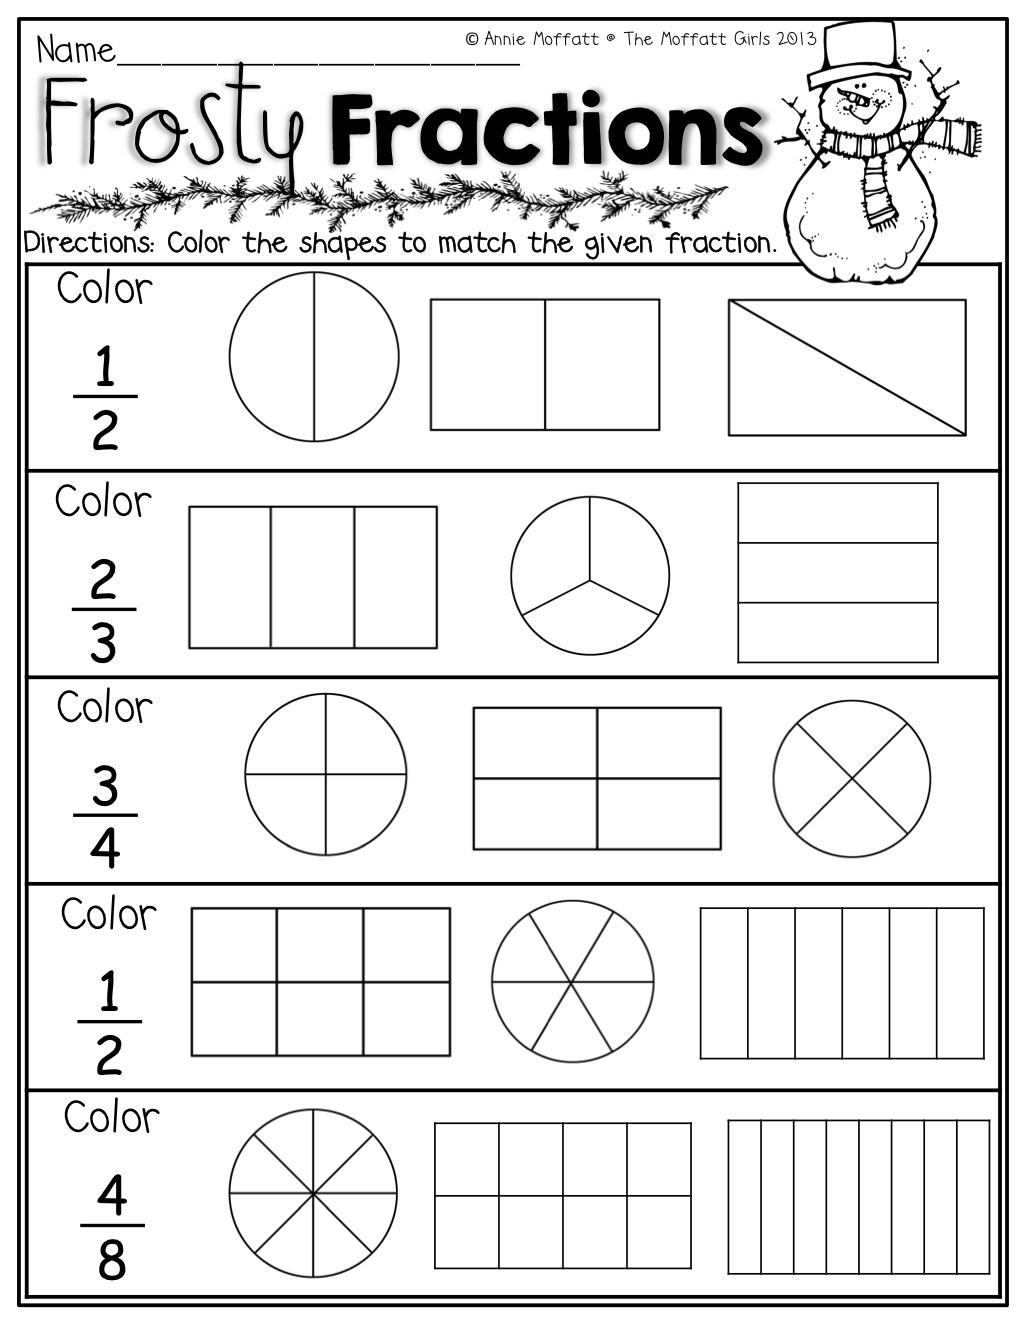 Alphabet Phonics Headbands Math, School and Math fractions